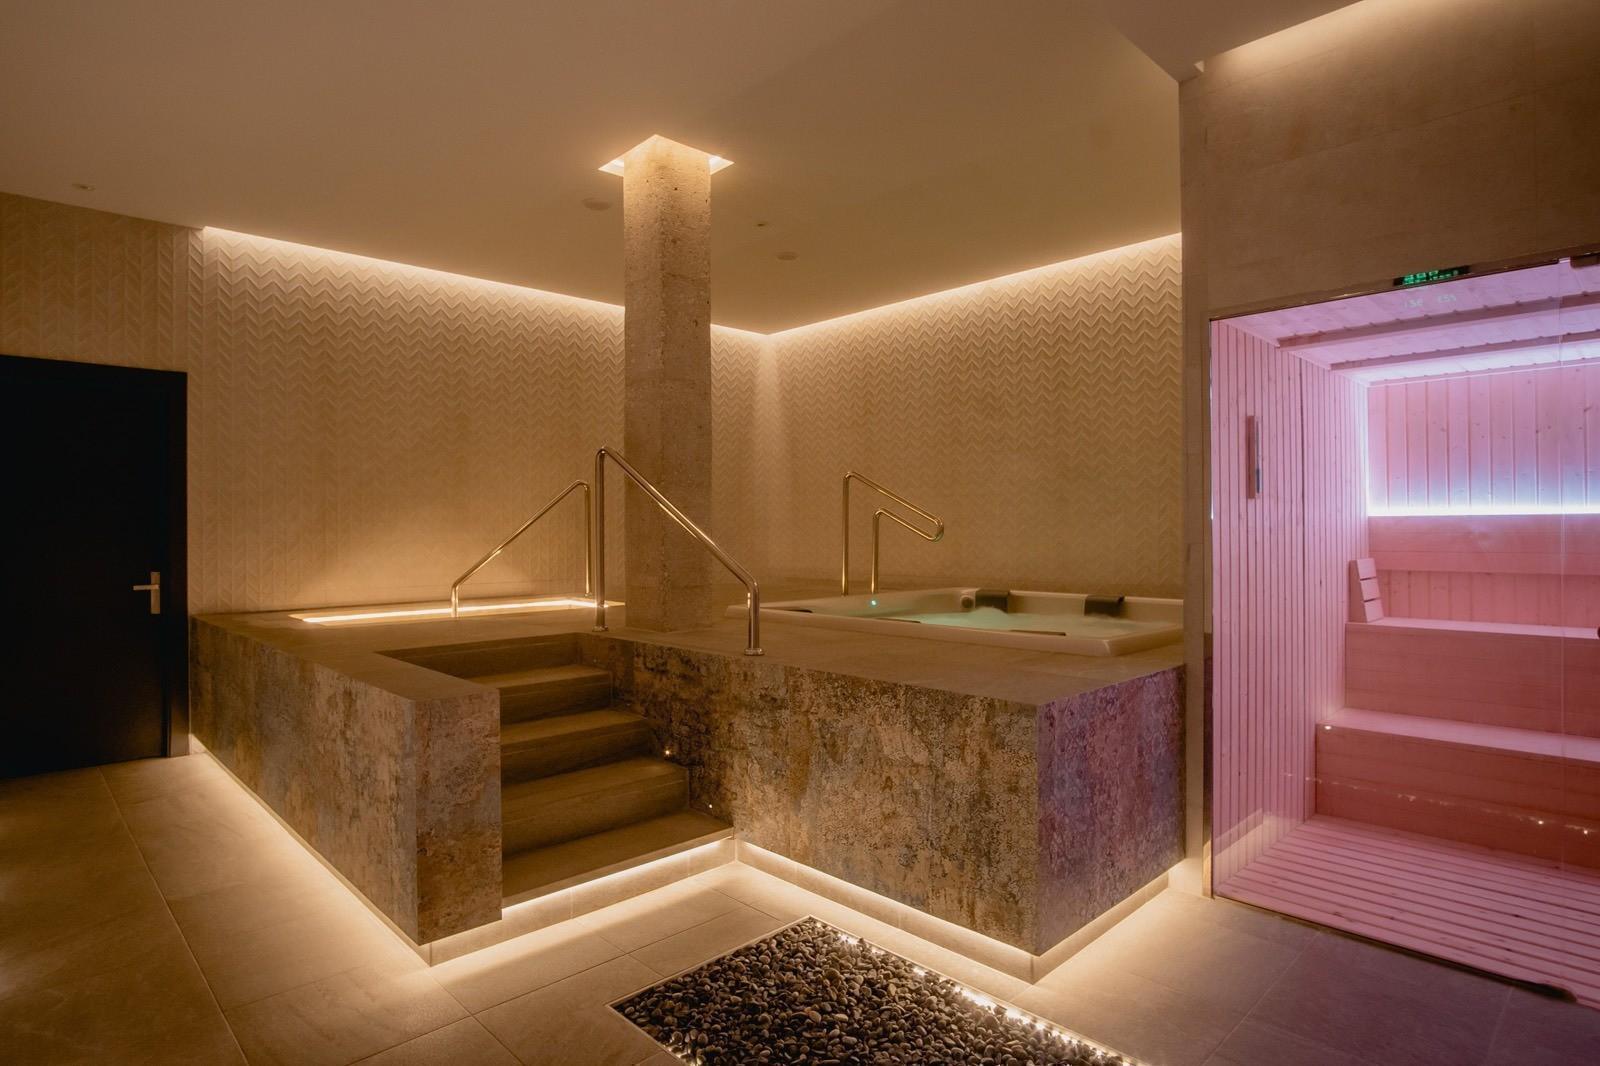 hotels/hotel_34/image_8.jpg